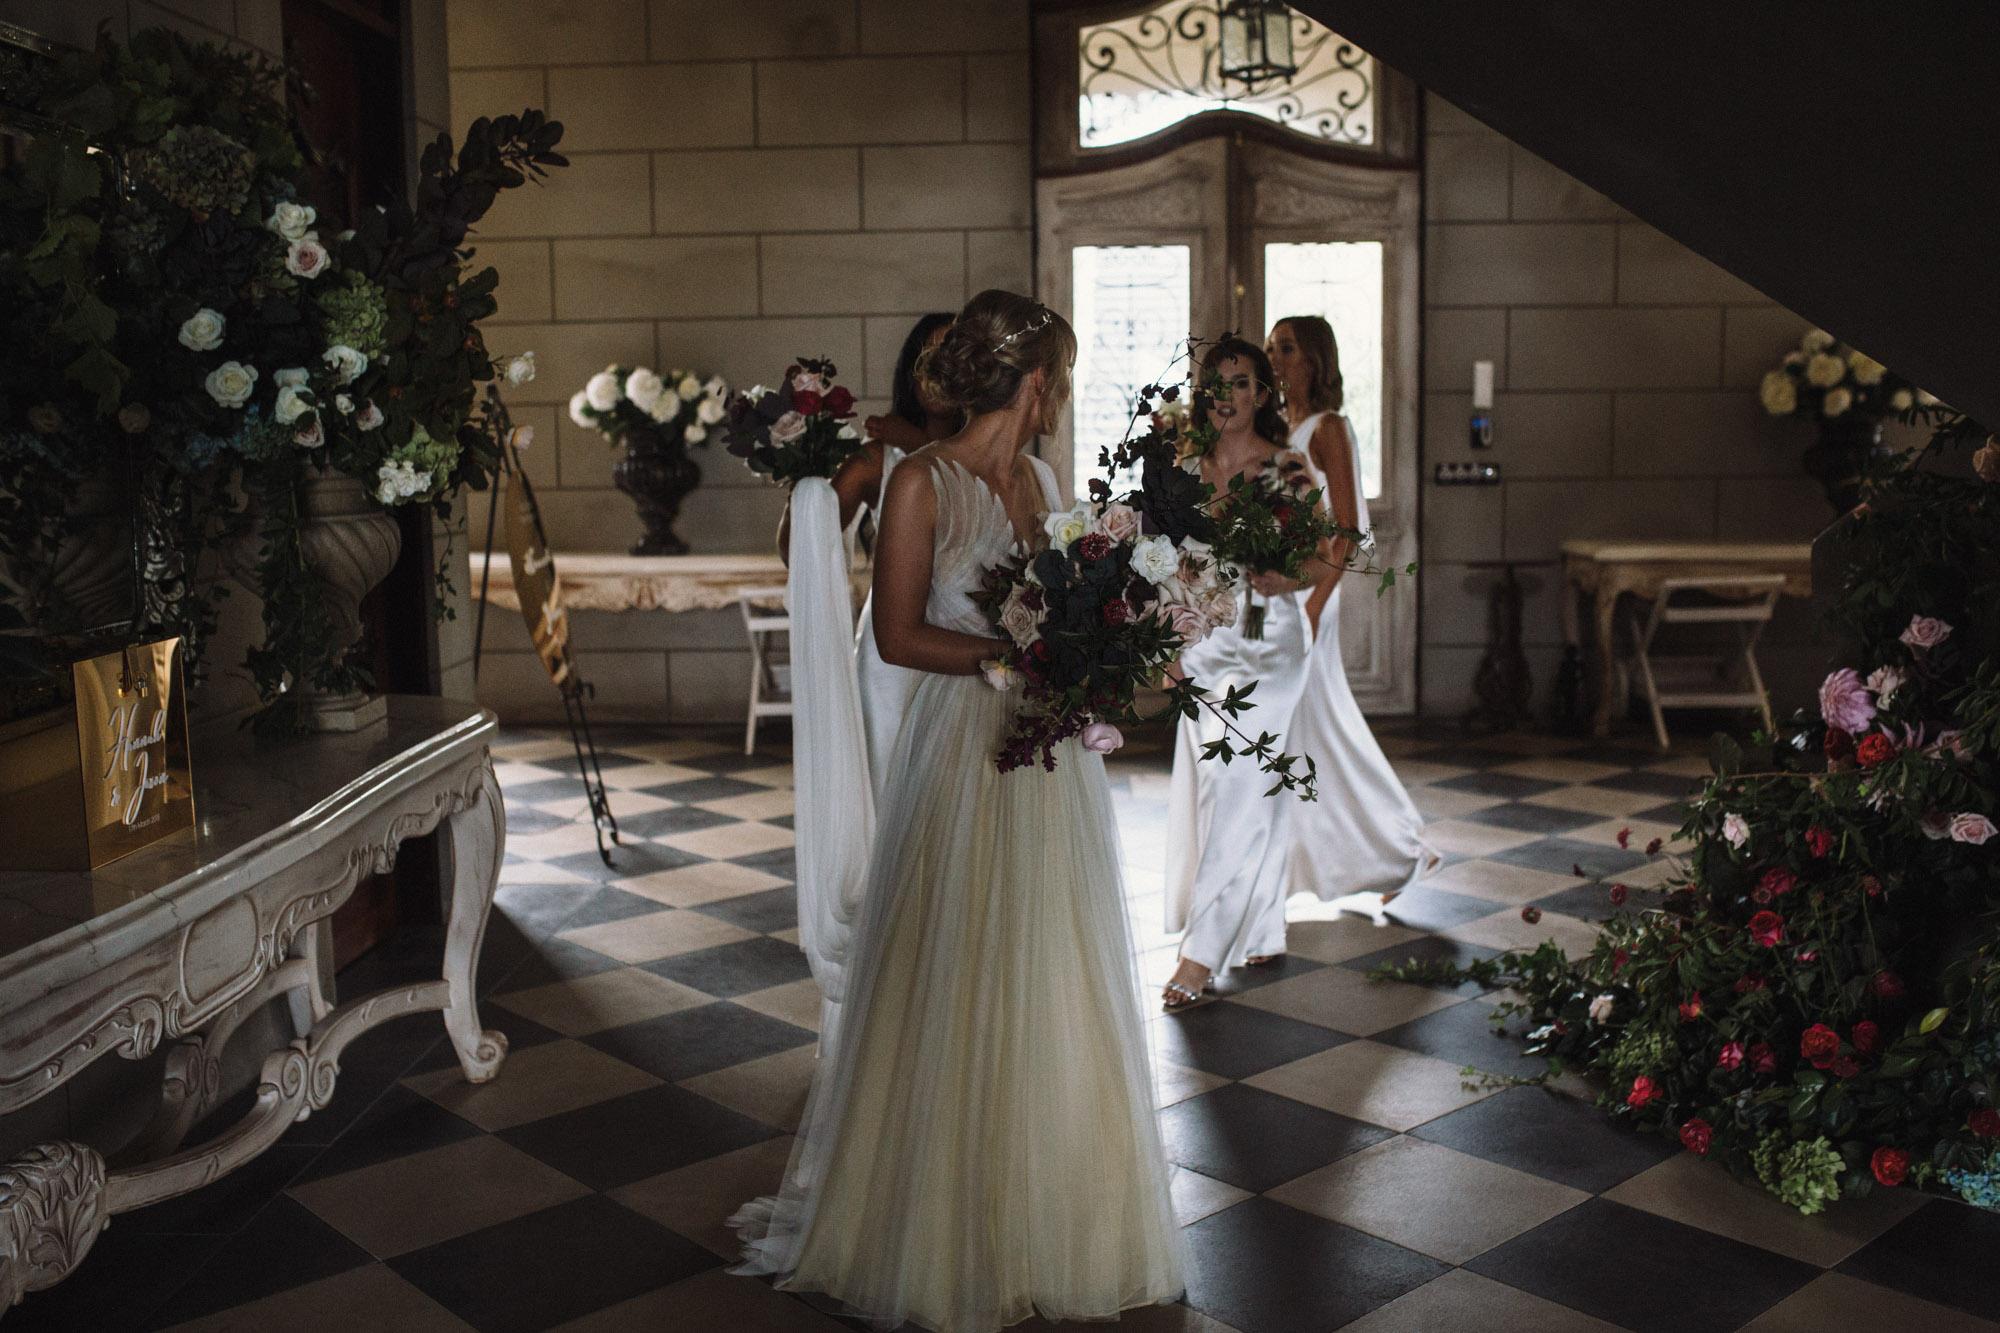 Campbell Point House Wedding HJ + Dean Raphael Weddings-66.jpg